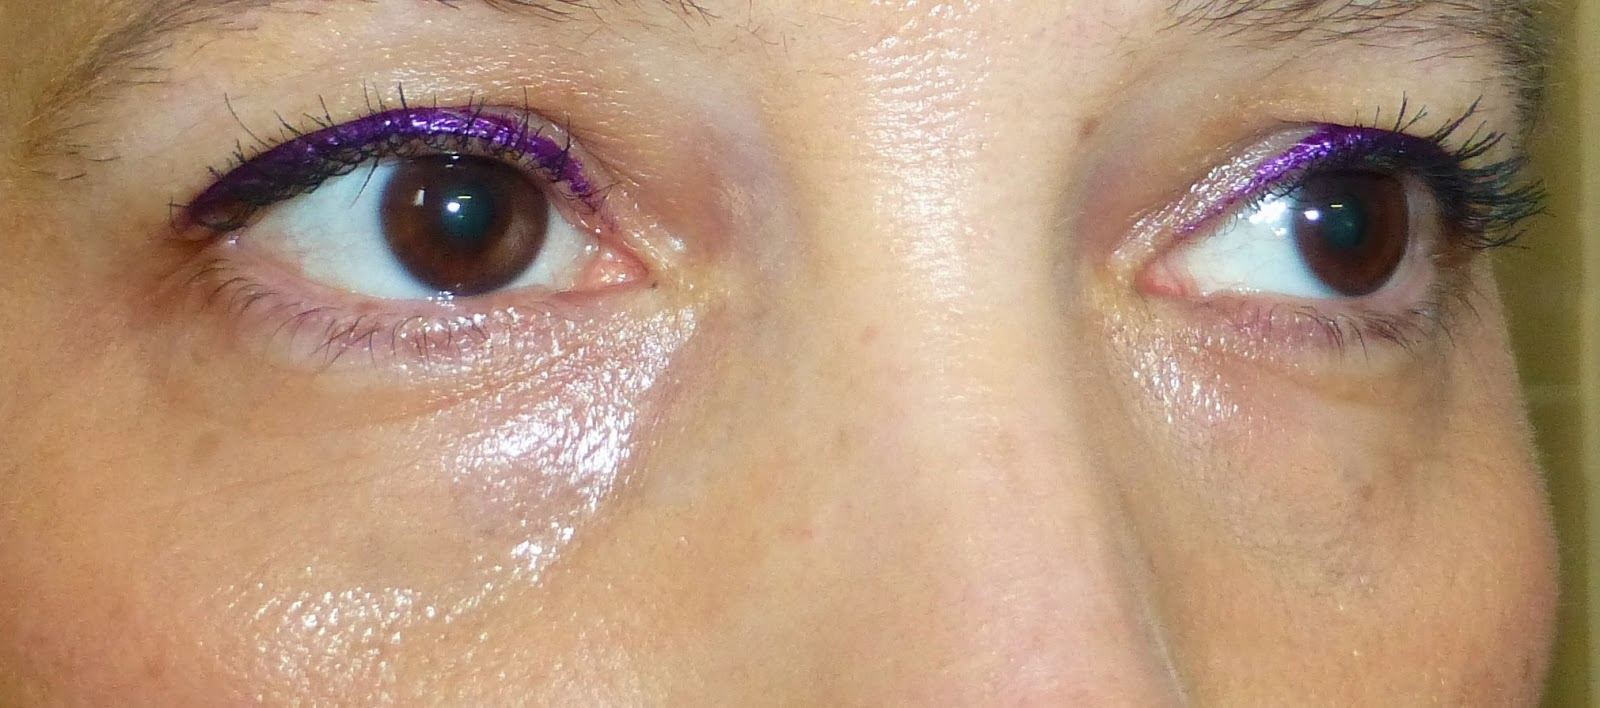 MAC Mineralize Concealer applied under eyes